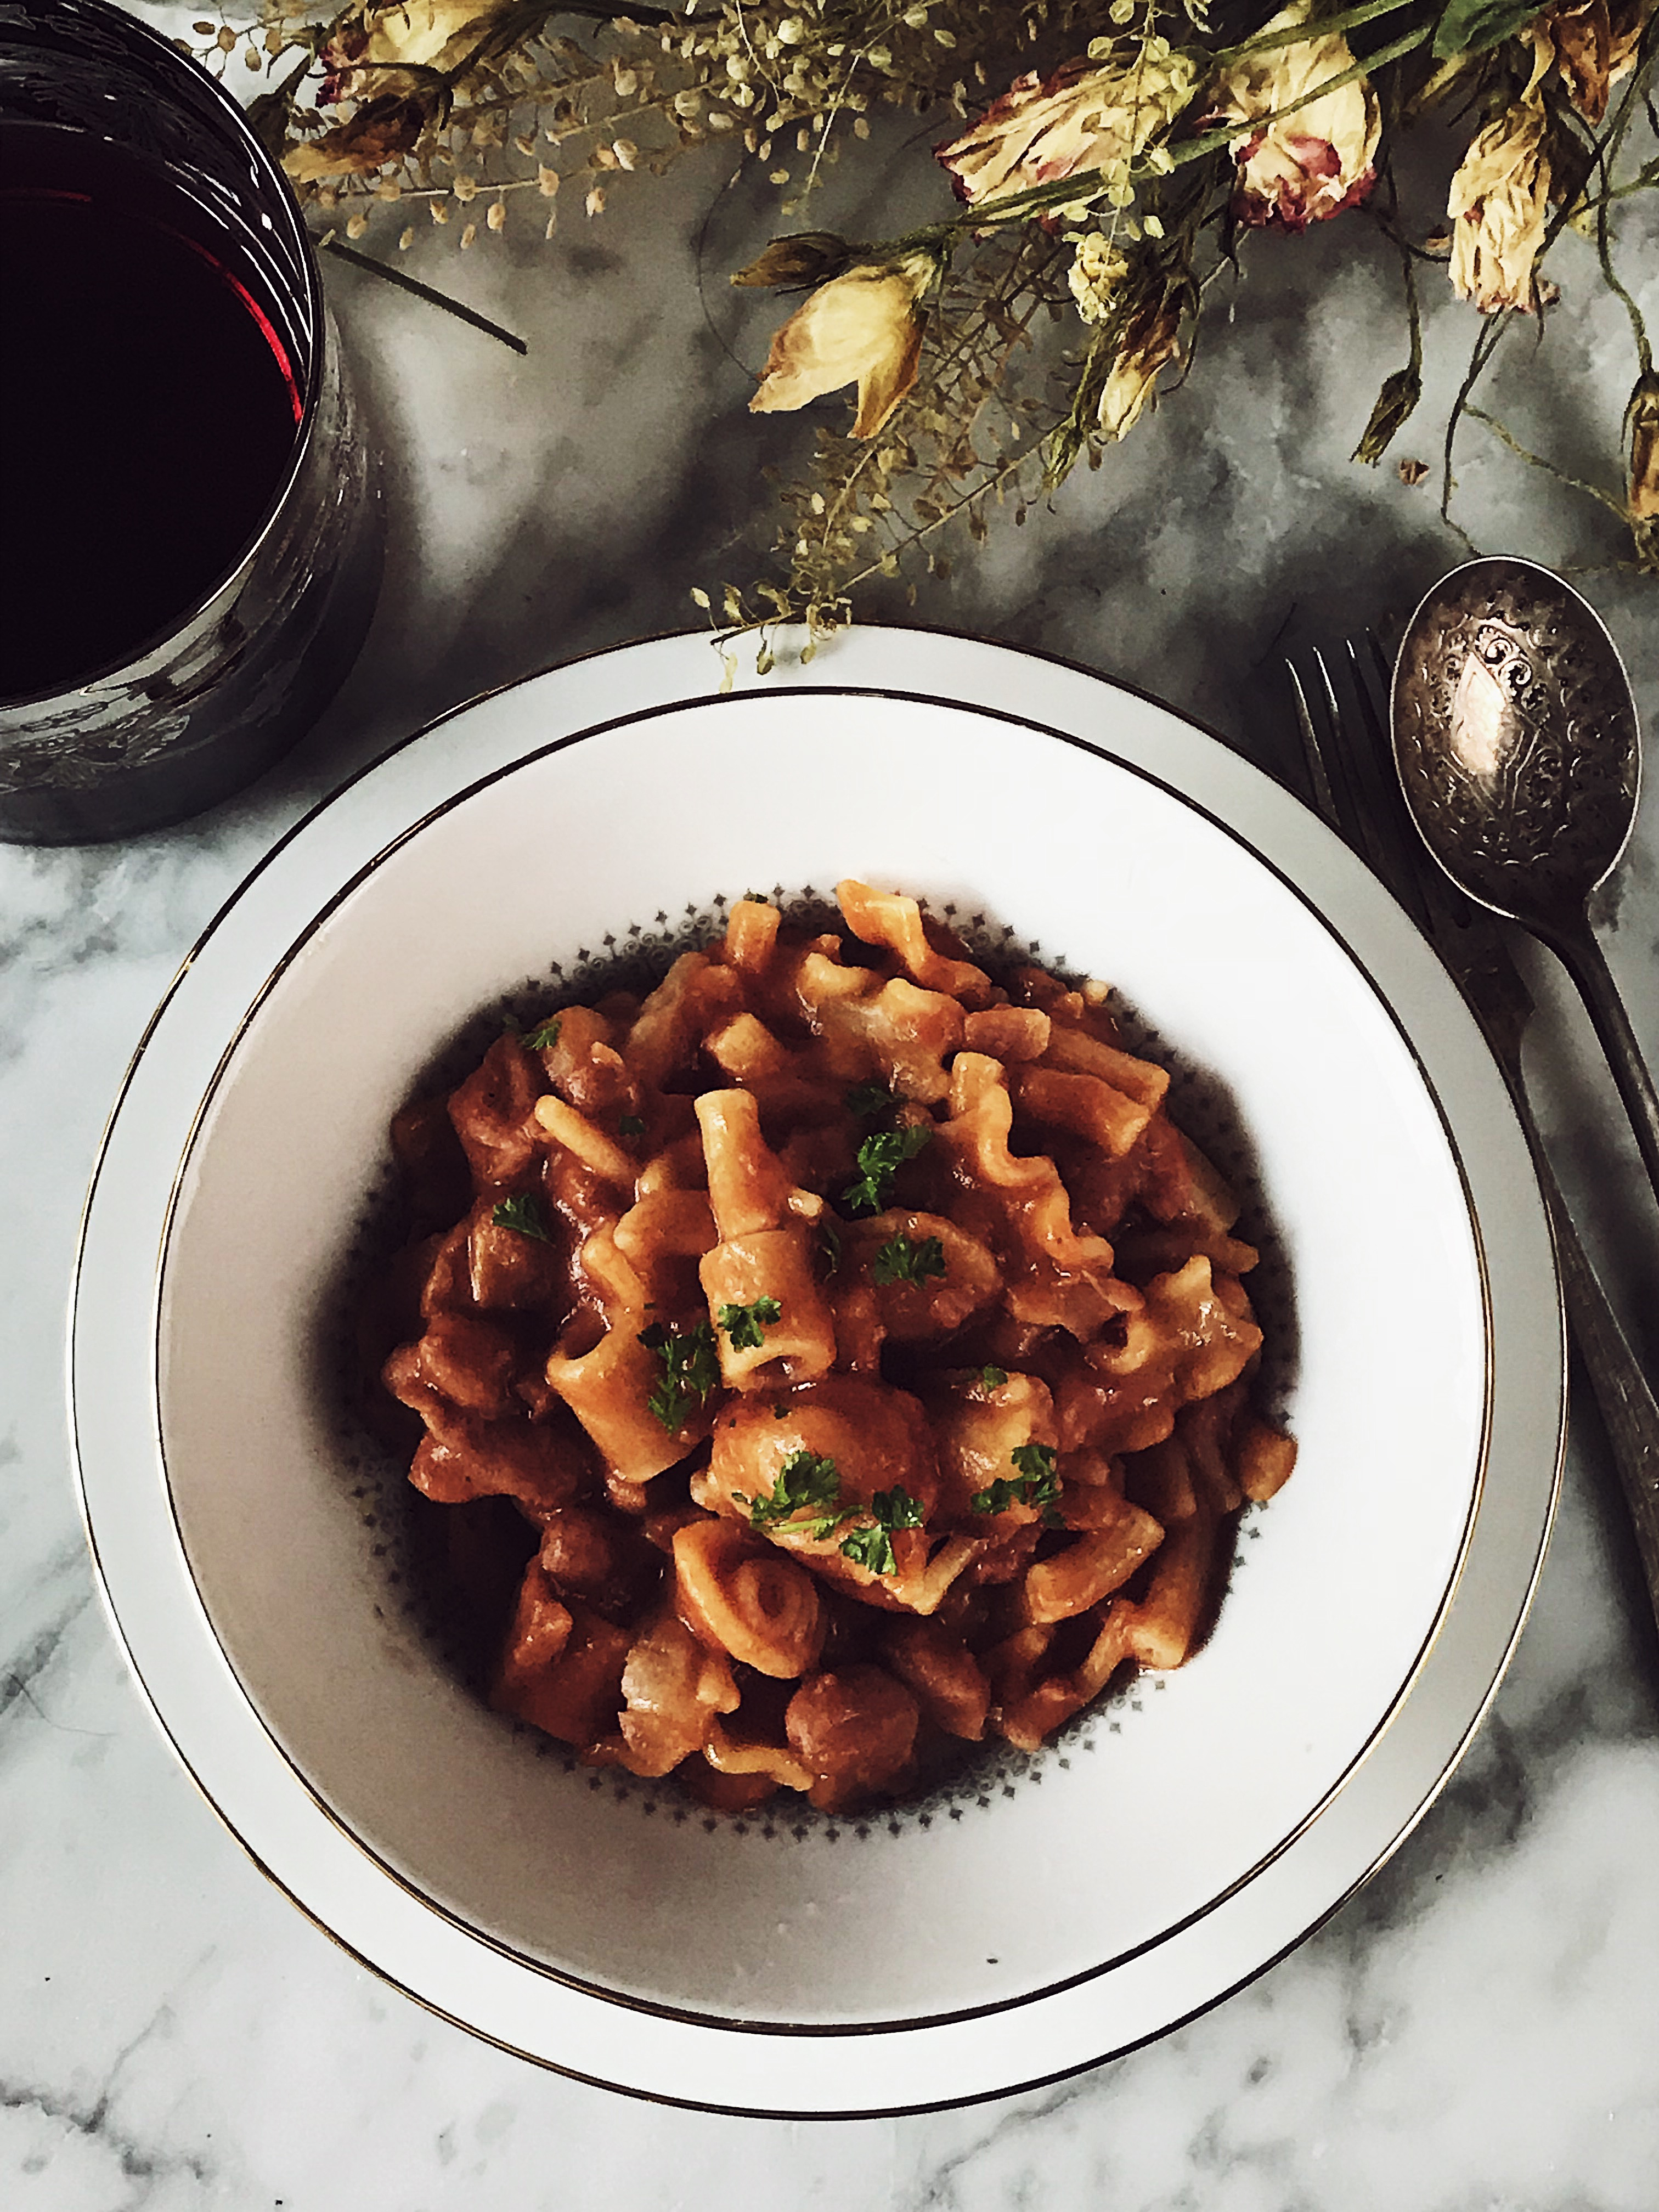 Pasta e fagioli recipe gourmet mag an italian food blog pasta e fagioli recipe by gourmet project forumfinder Choice Image